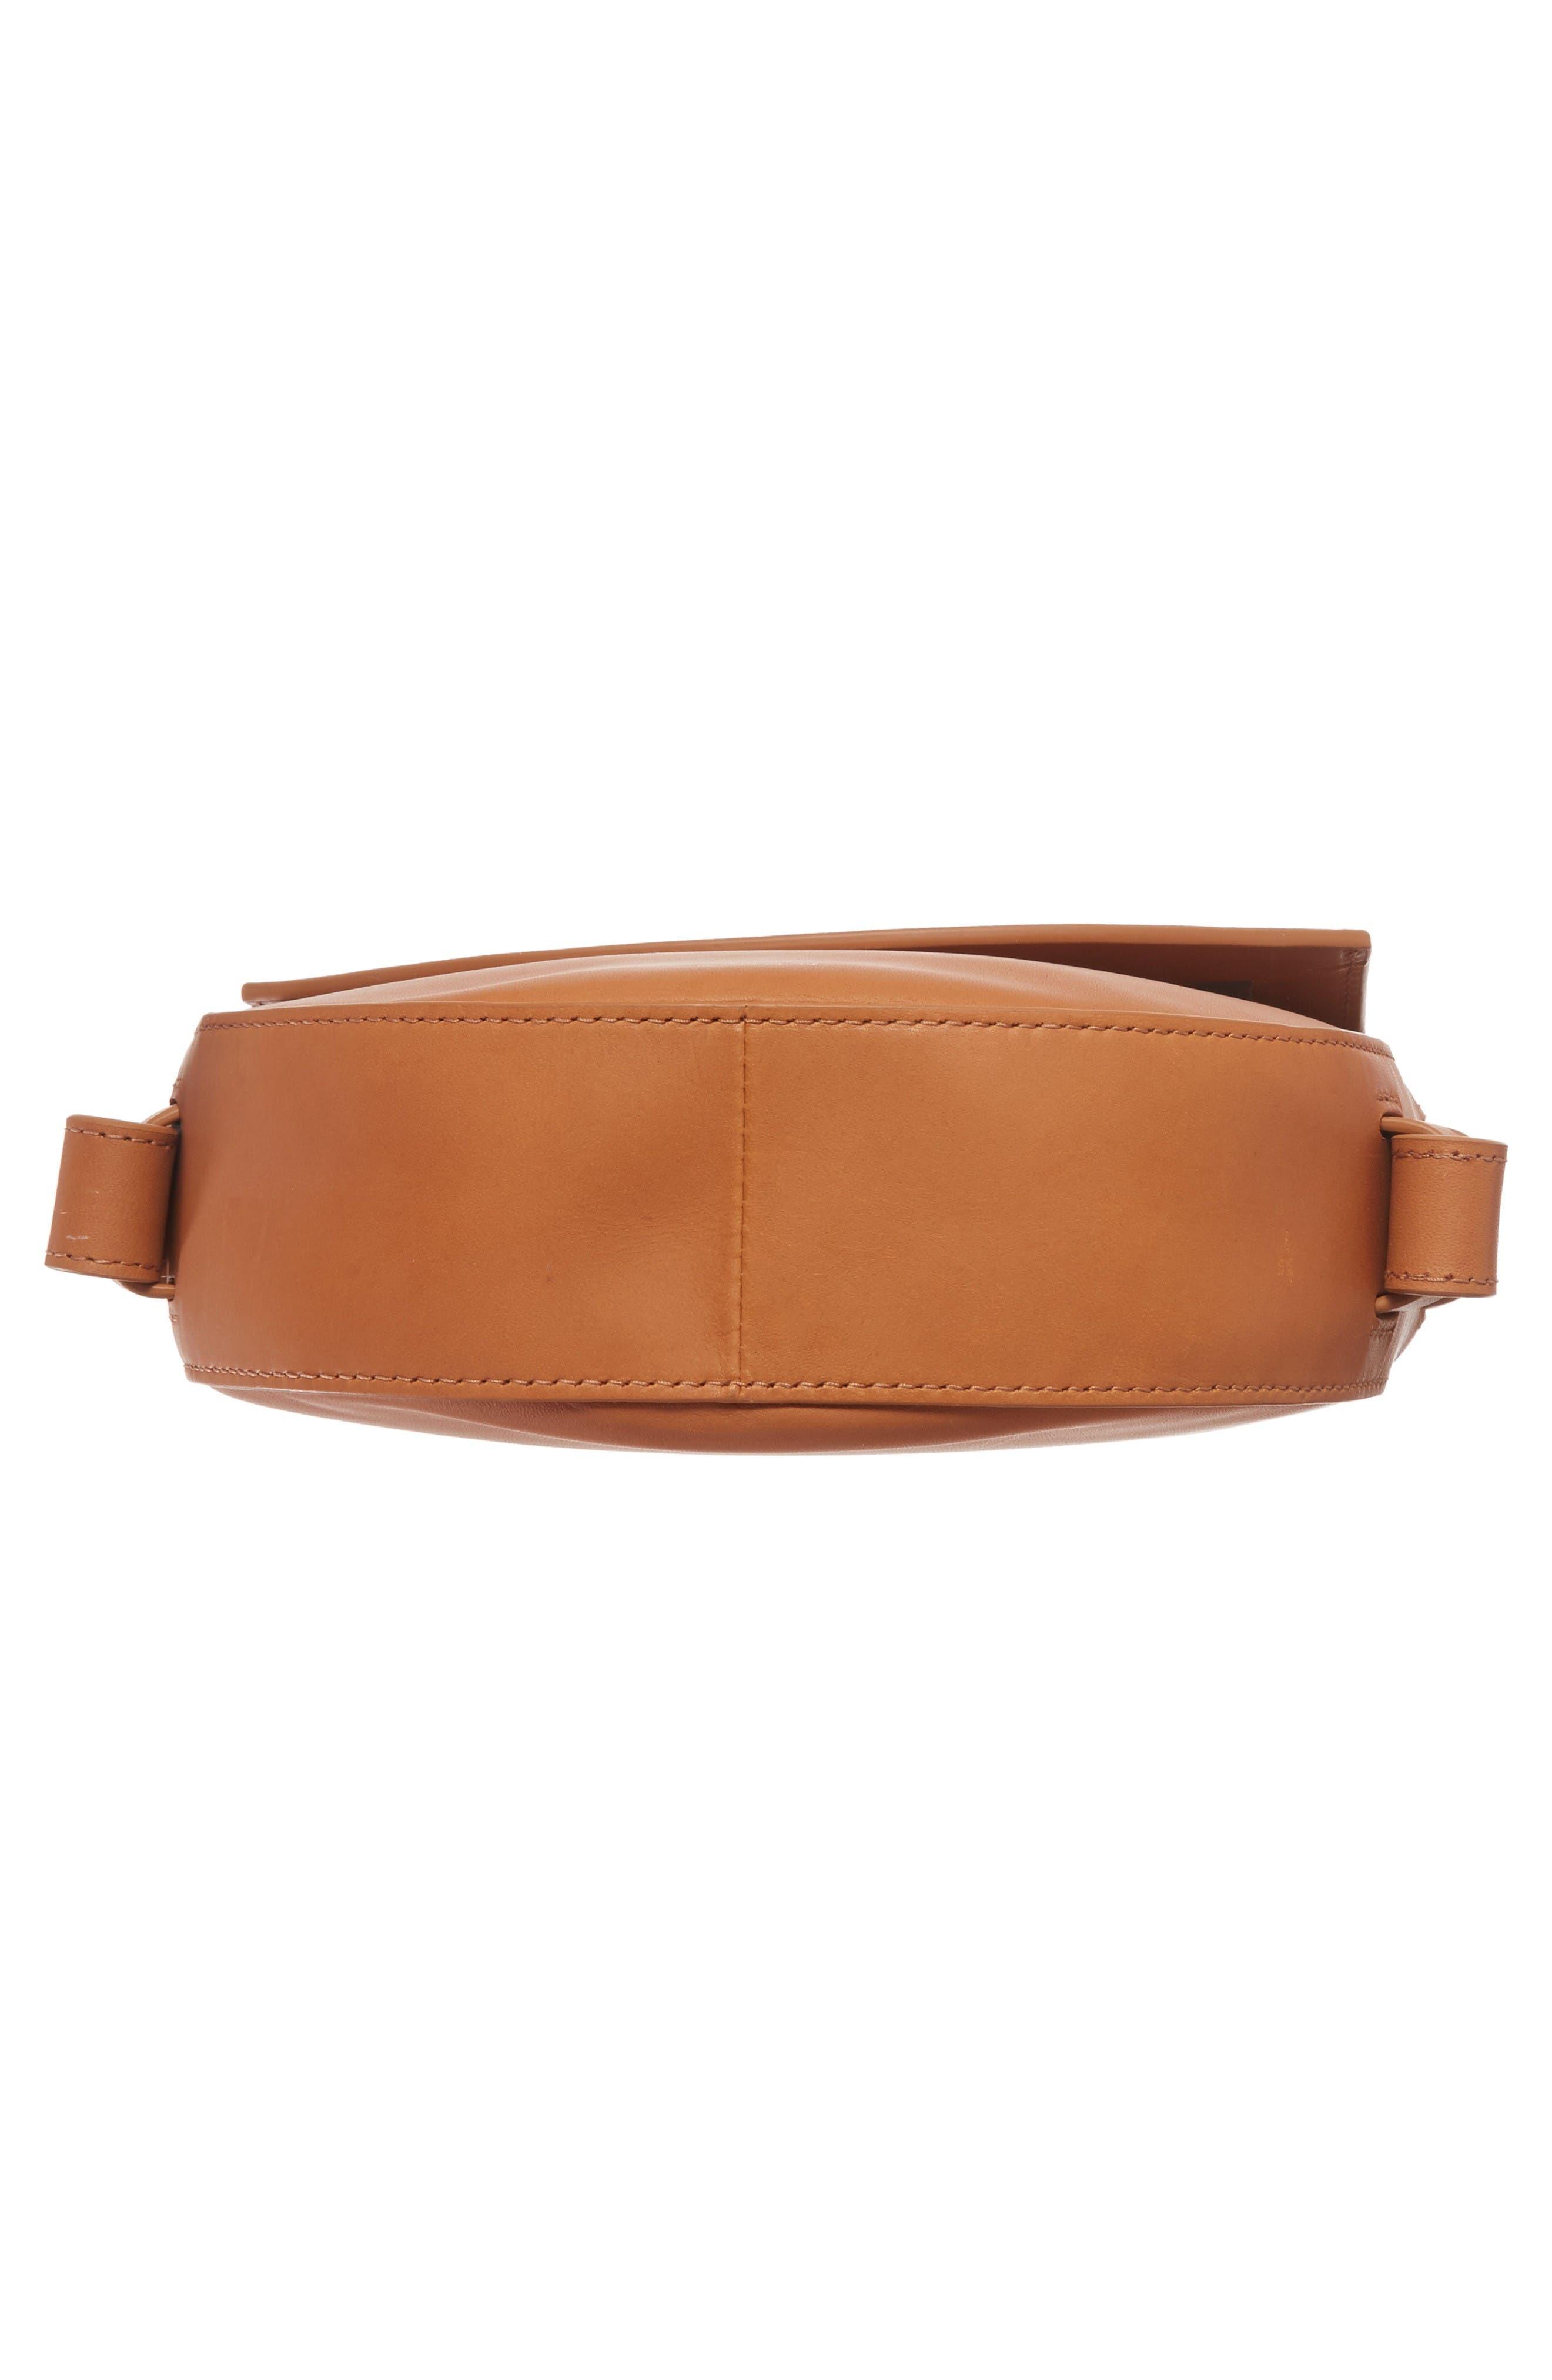 Lobelle Leather Saddle Bag,                             Alternate thumbnail 6, color,                             Tan